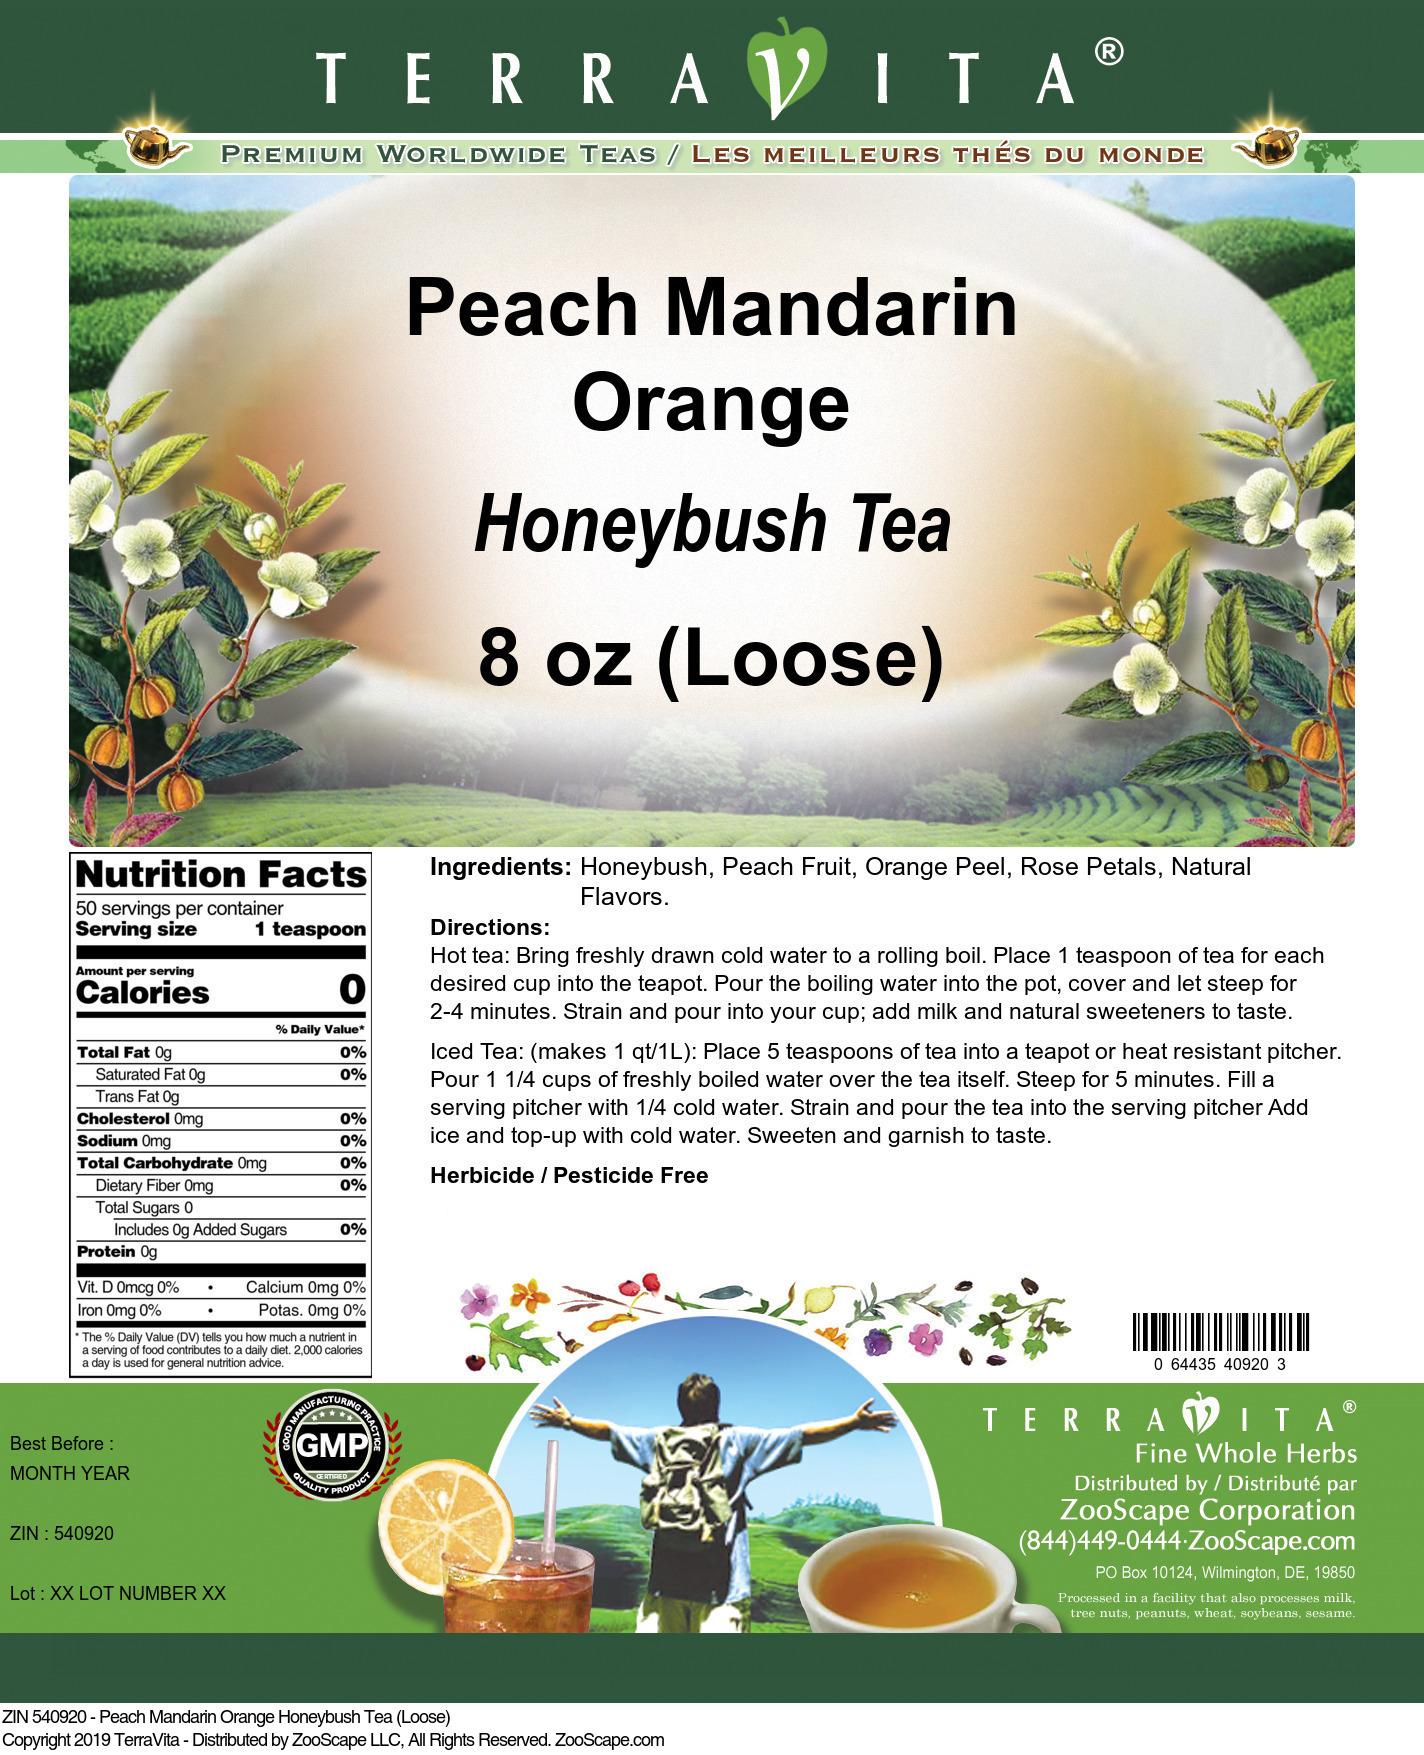 Peach Mandarin Orange Honeybush Tea (Loose)